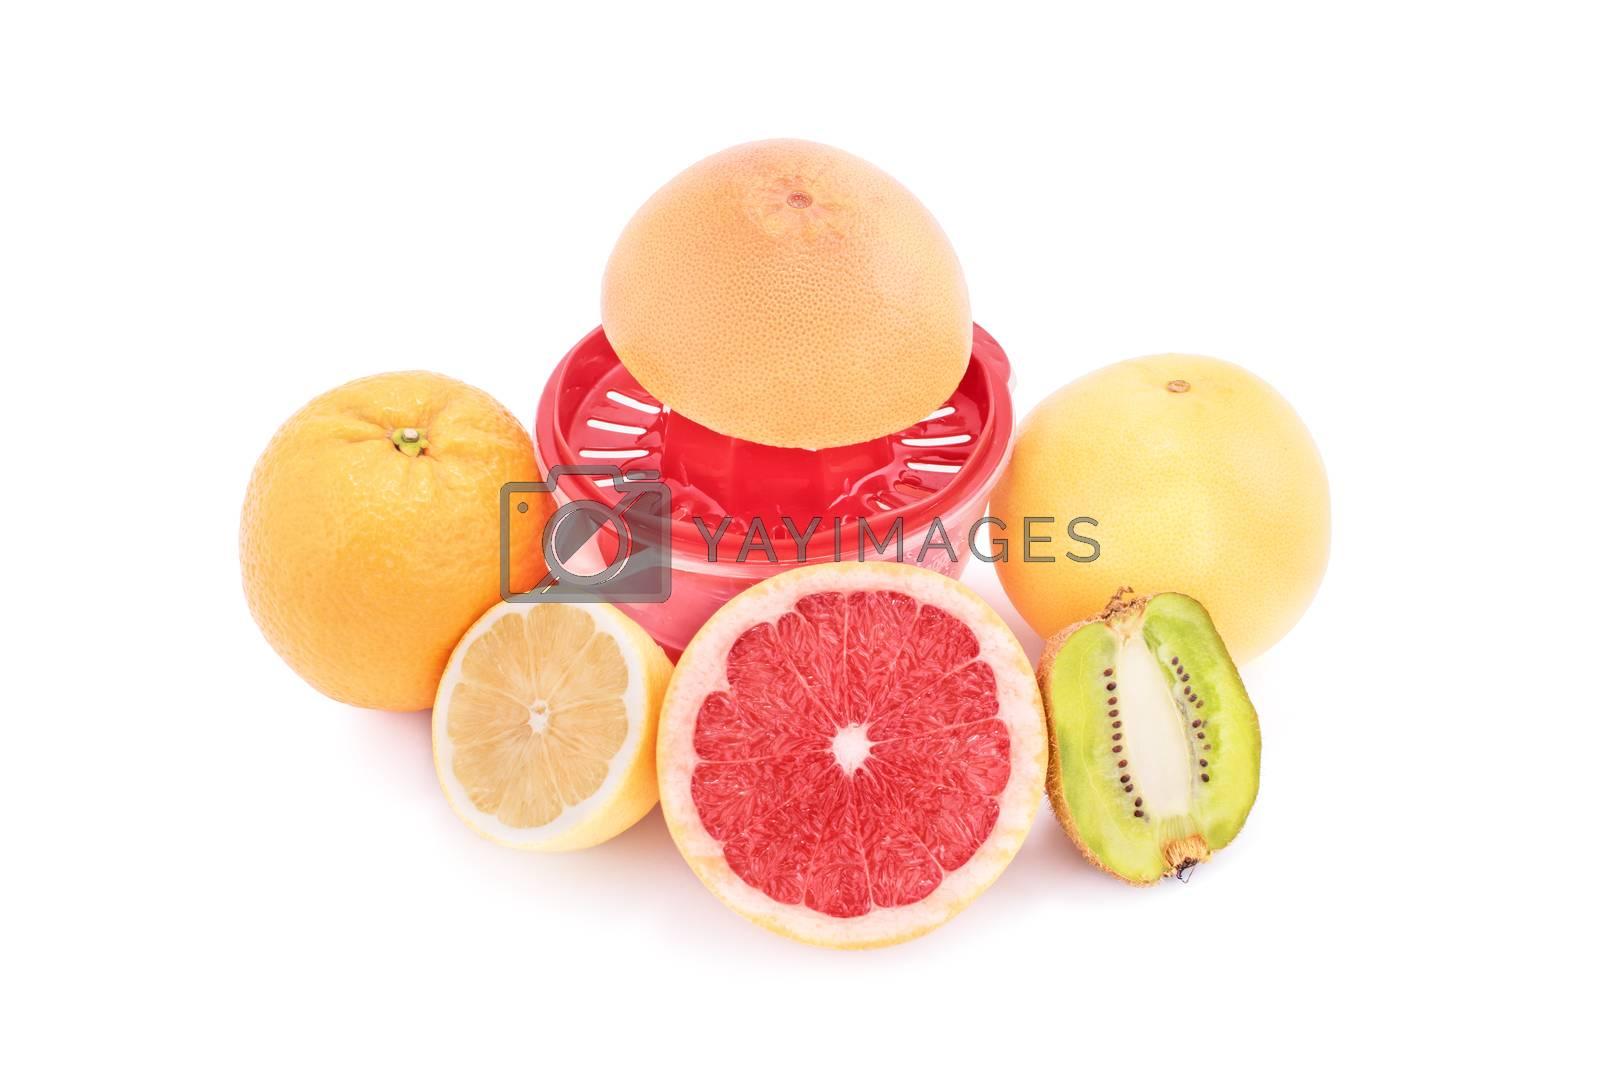 Squeezer and different fruits, isolated on white background. Orange, grapefruit, lemon and kiwi with a juice squeezer, isolated on white background.